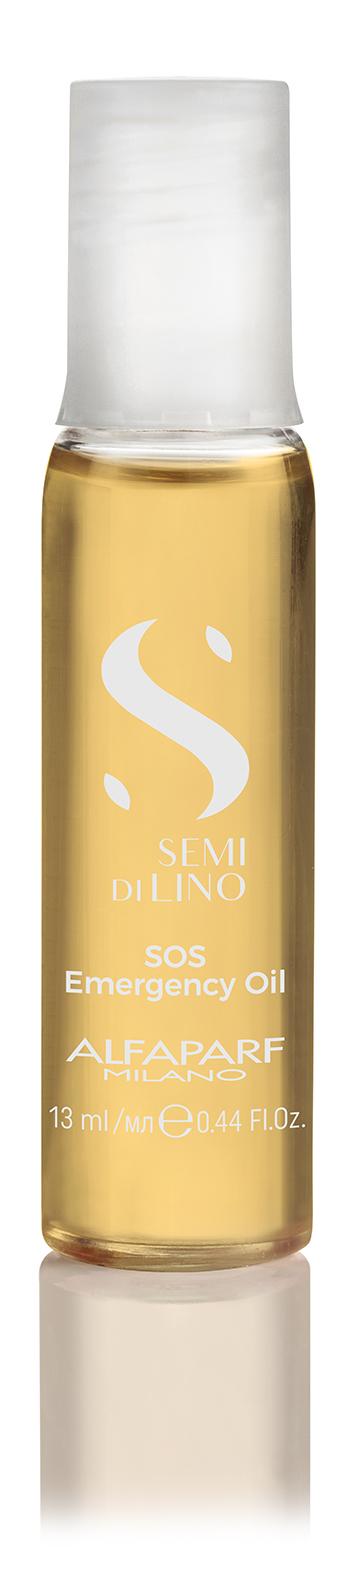 New Масло, восстанавливающее структуру волос SDL RECONSTRUCTION SOS EMERGENCY OIL, 6 АМПУЛ ПО 13 МЛ ALFAPARF 16413